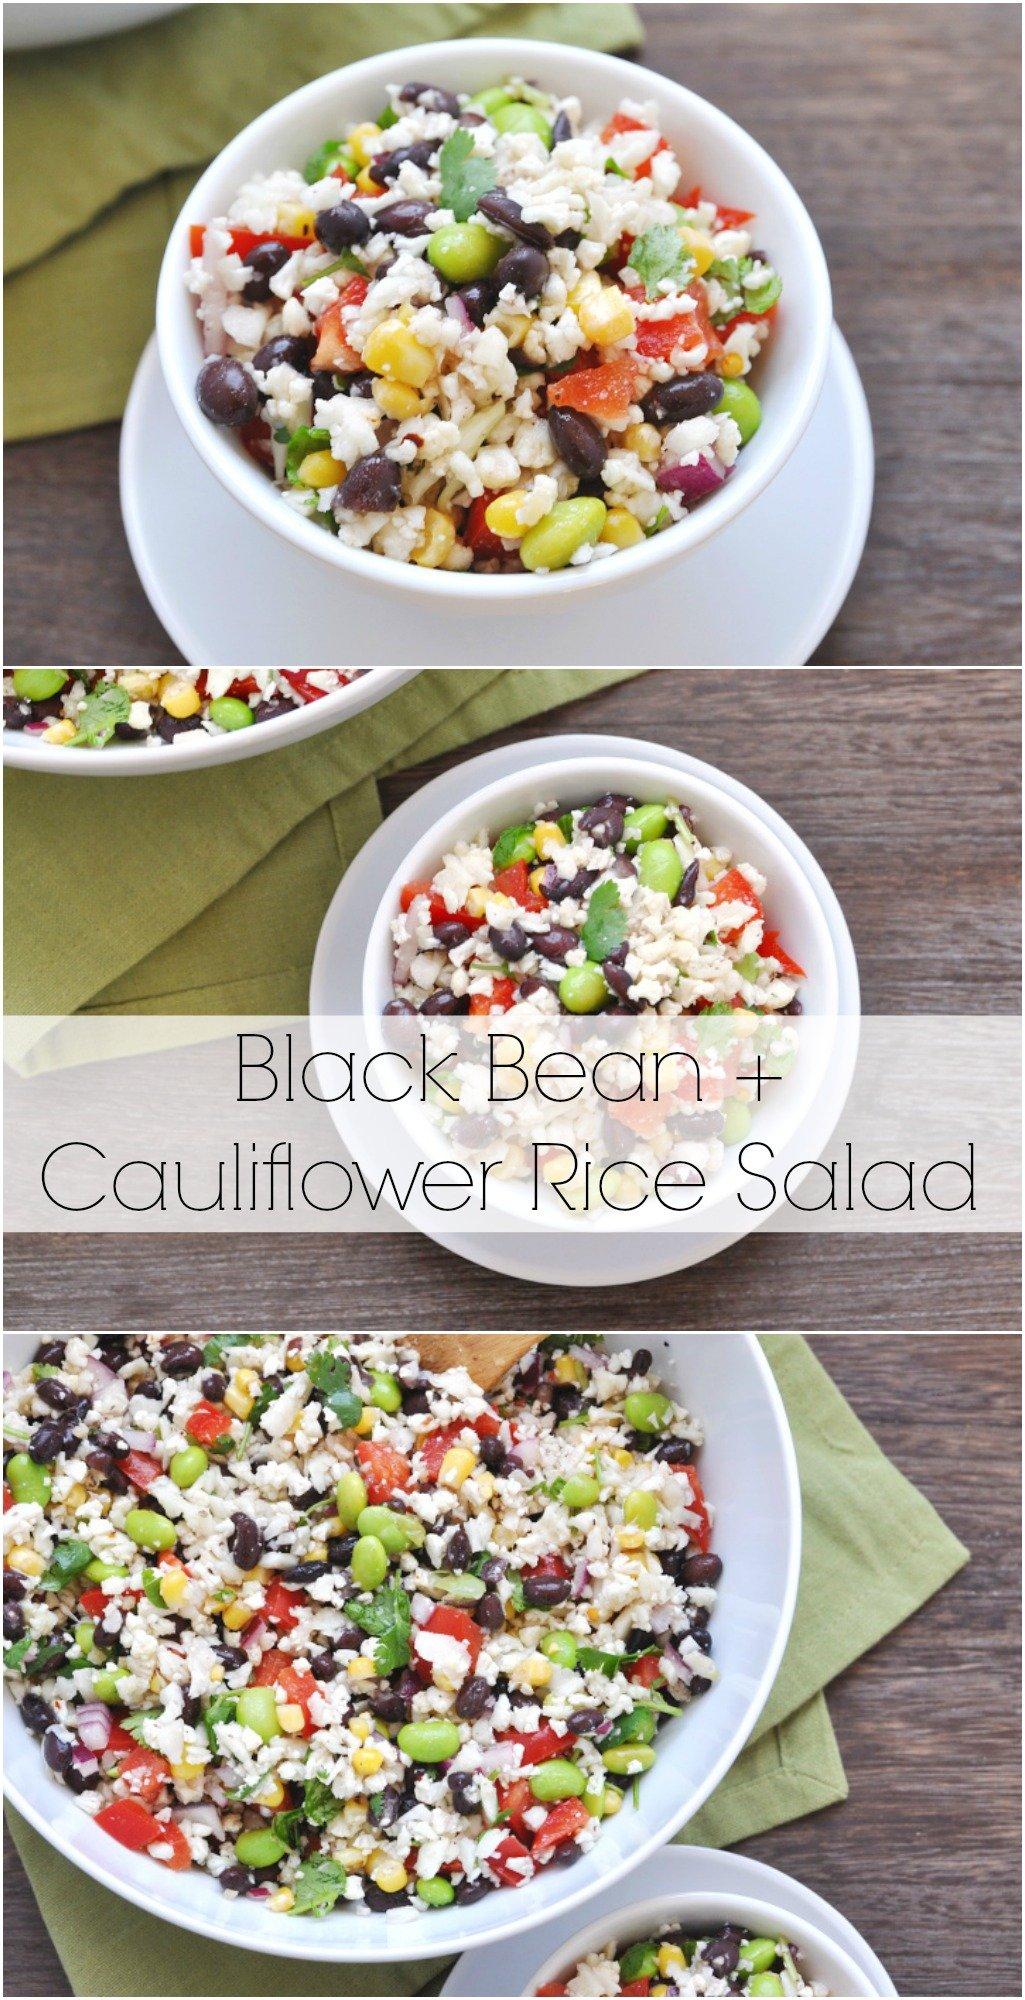 Black Bean and Cauliflower Rice Salad